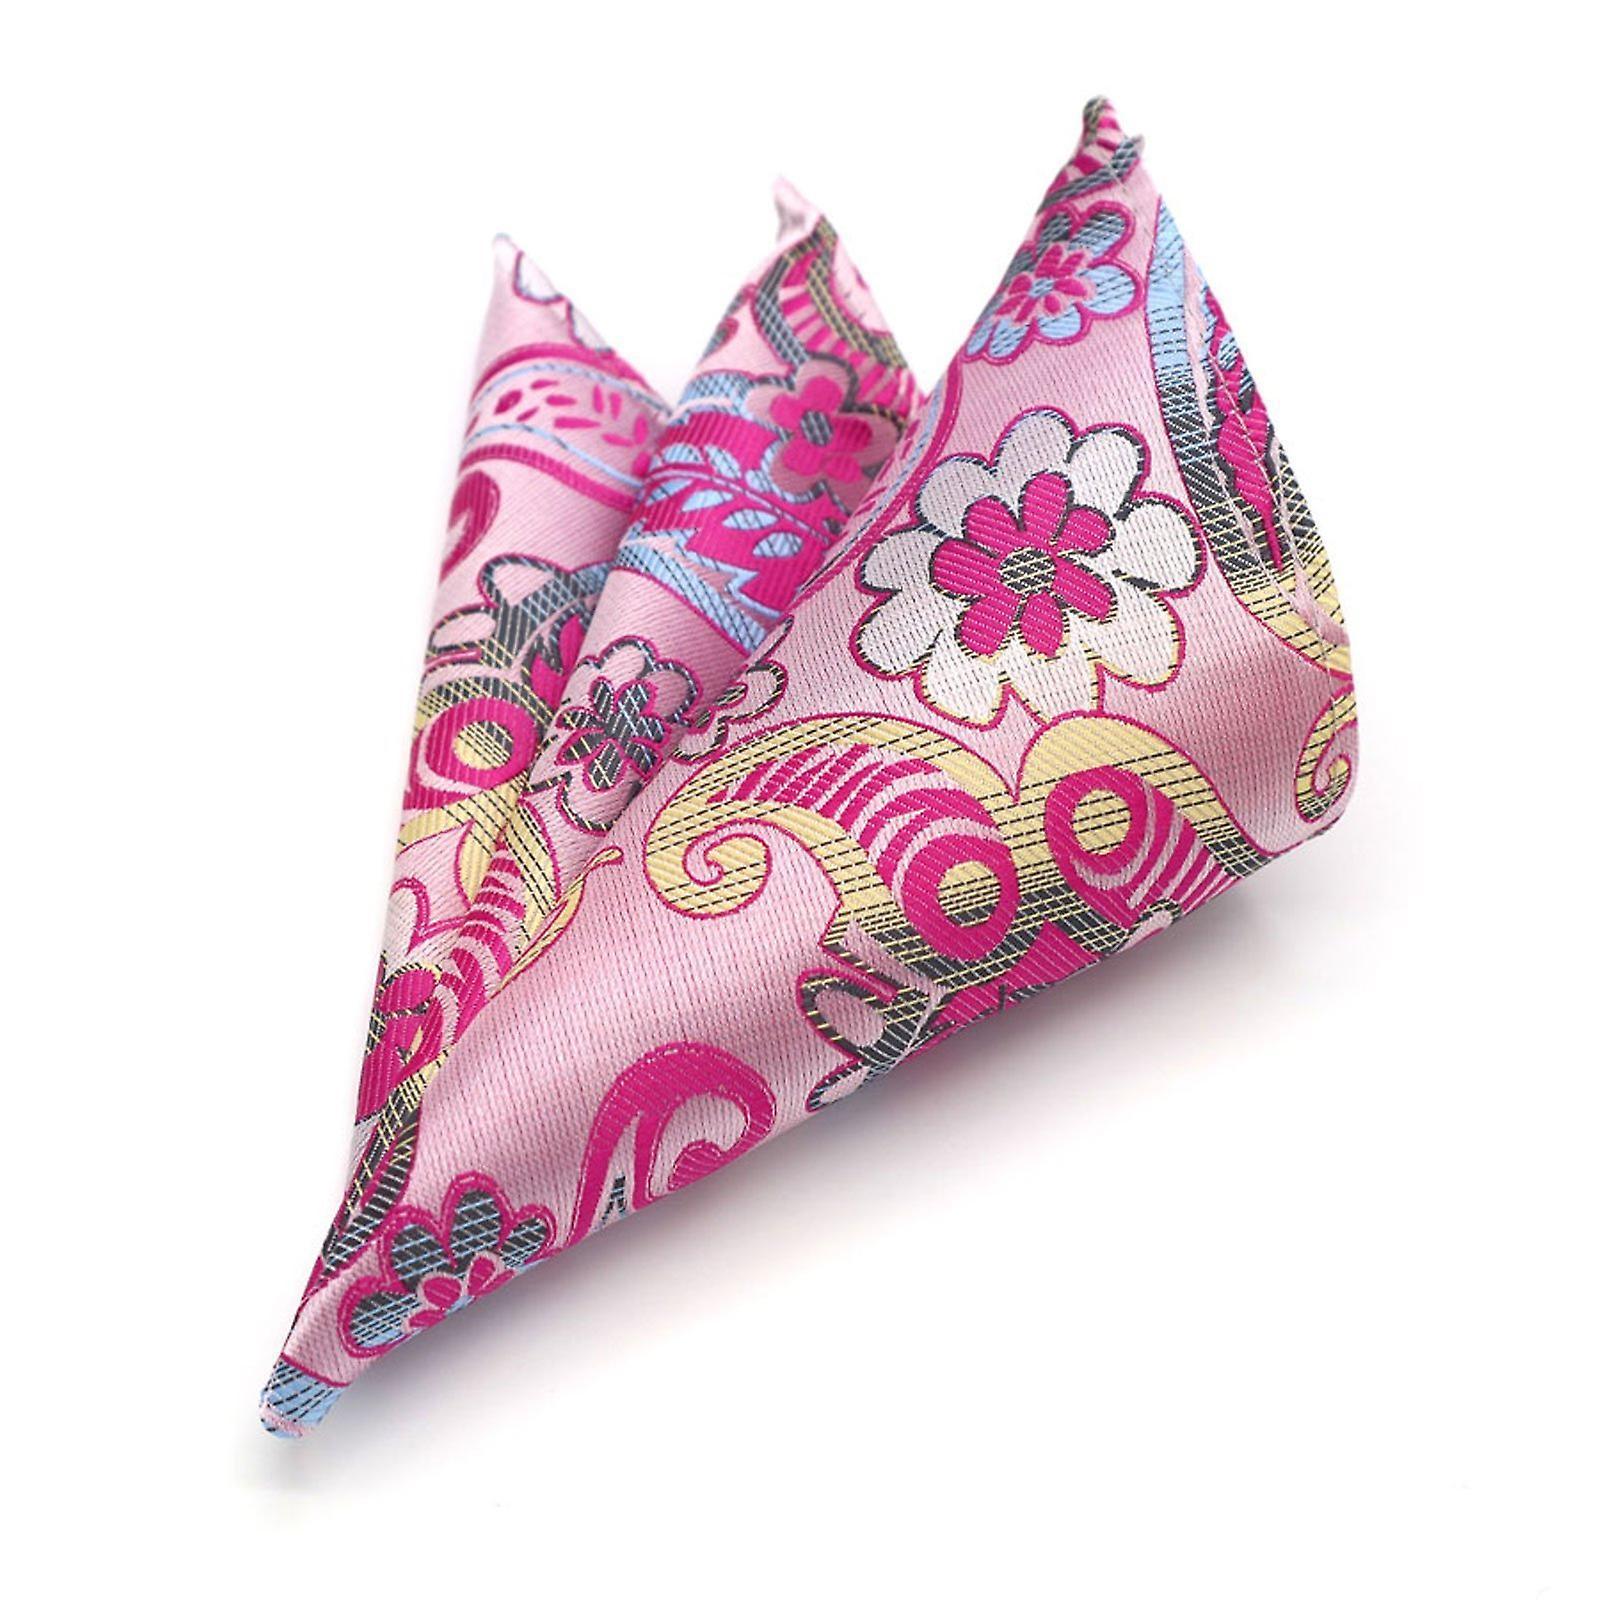 Pink & yellow swirl pattern designer look pocket square